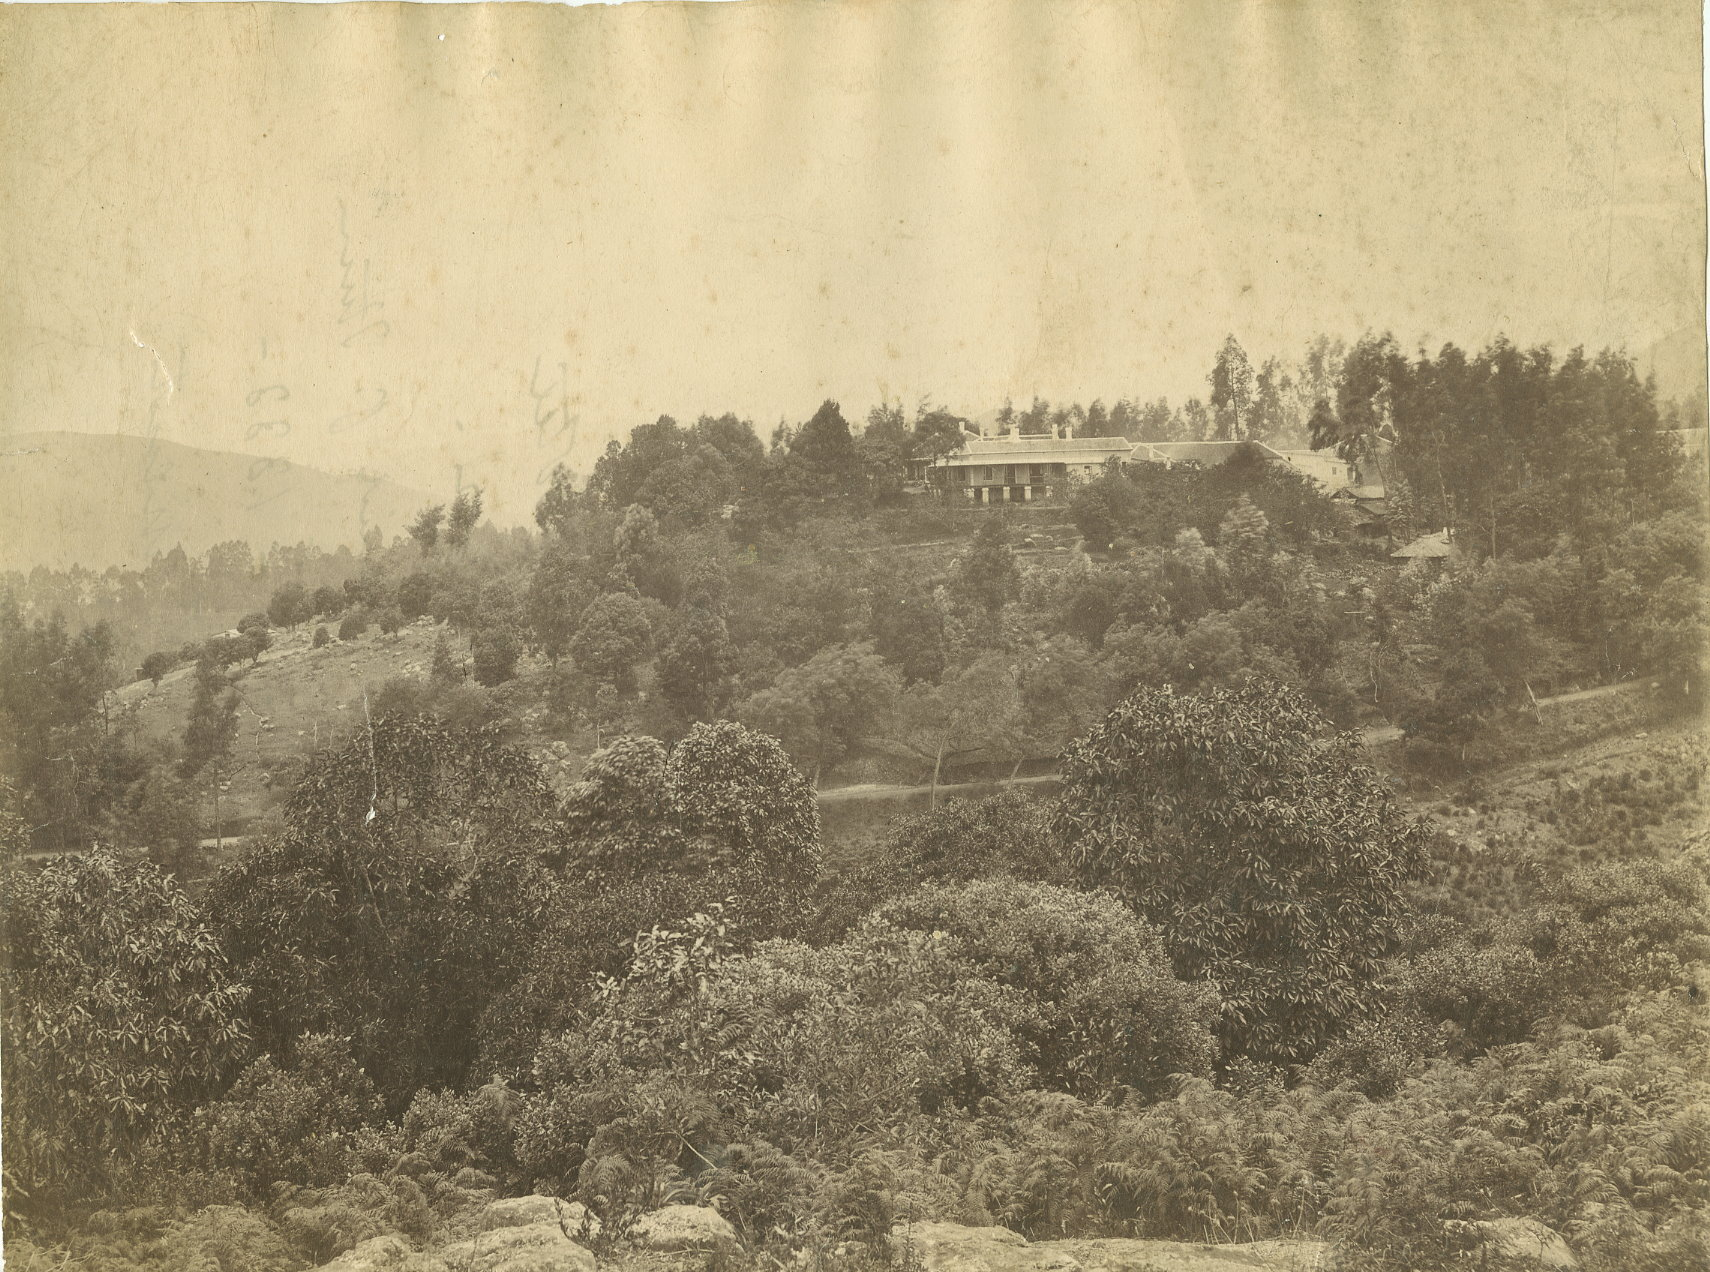 Vintage Photograph of Glenview Hotel - Coonoor, Tamil Nadu- Circa 1888